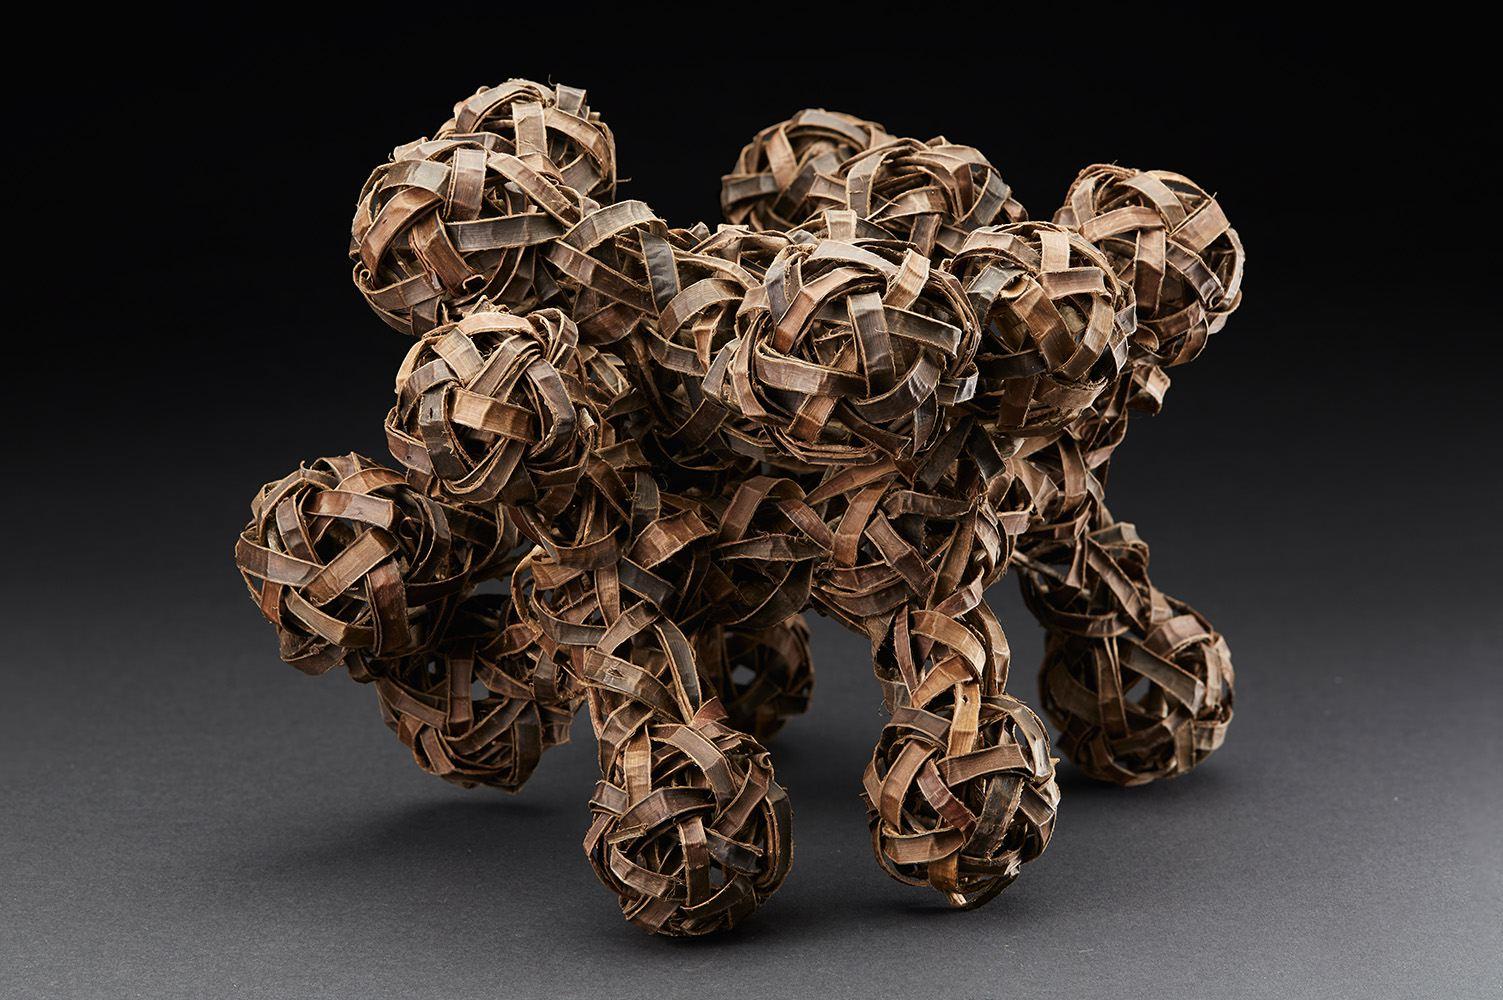 Ritsuko Jinnouchi  Replacement 1  , 2015 Plaited walnut bark 11.81 x 10.24 x 10.24 inches 30 x 26 x 26 cm RJi 8